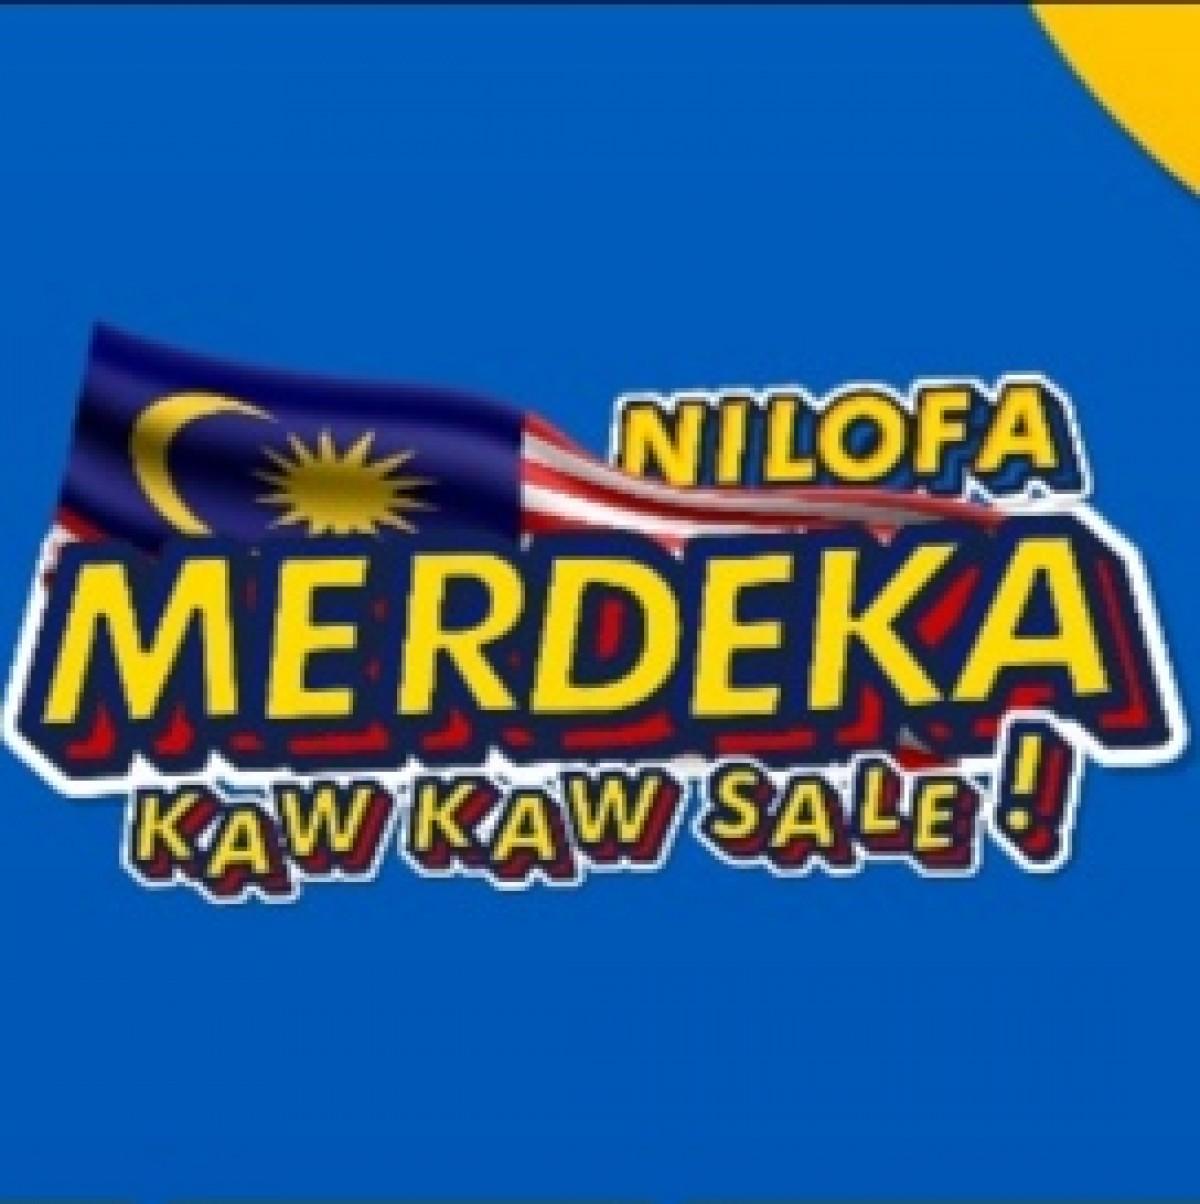 Nilofa Merdeka Kaw Kaw Sale (6 Pouch) - MARKAZ TIJAARI